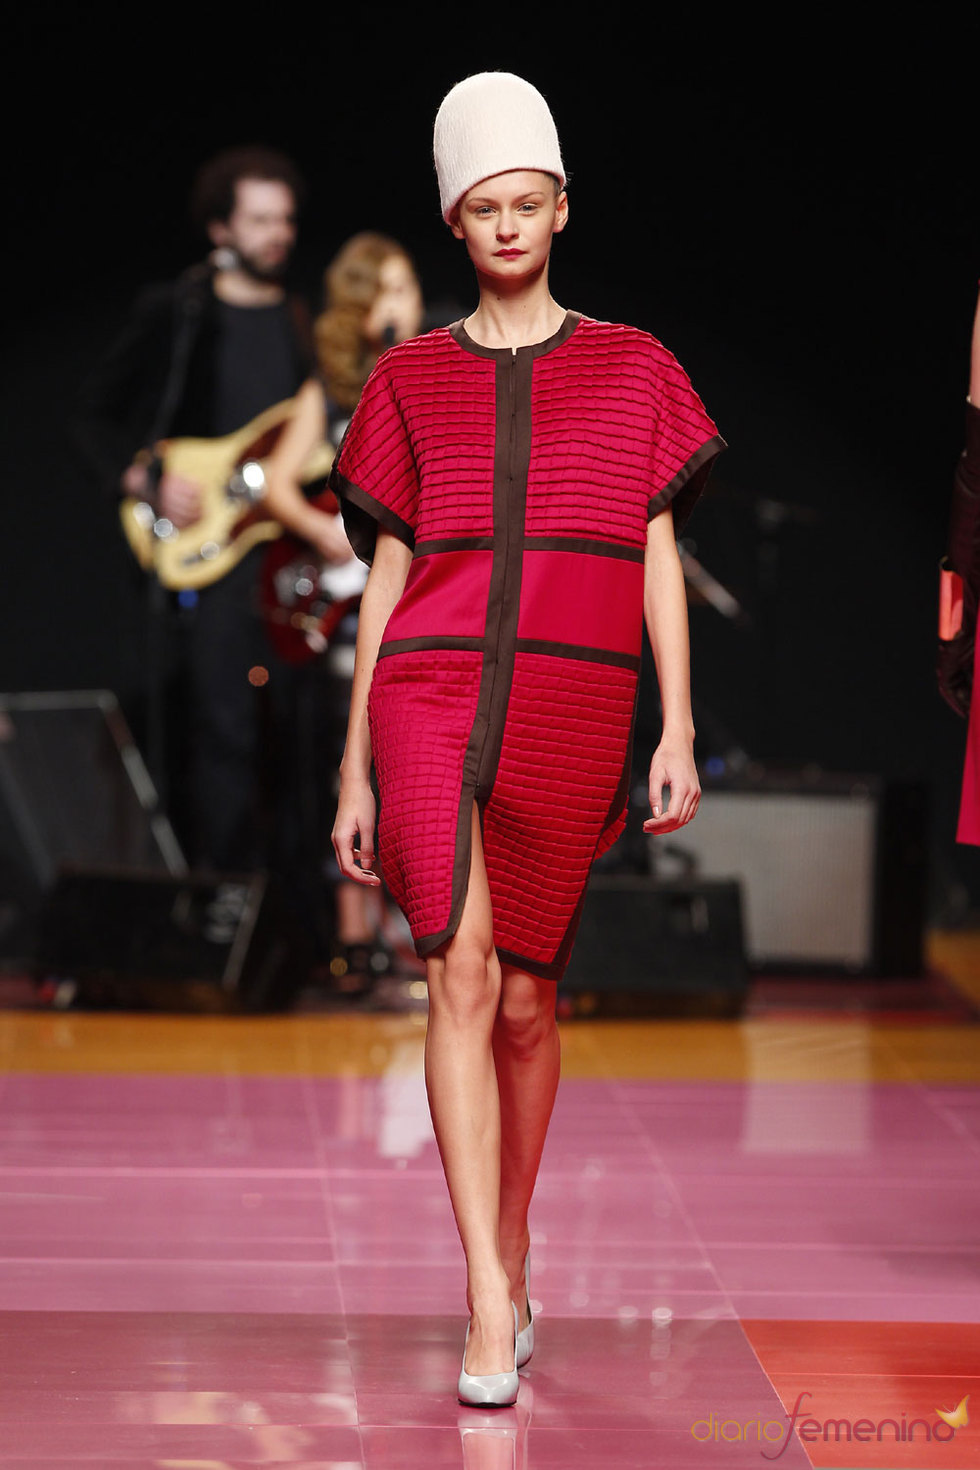 Duyos en rojo -  Cibeles Fashion Week 2010